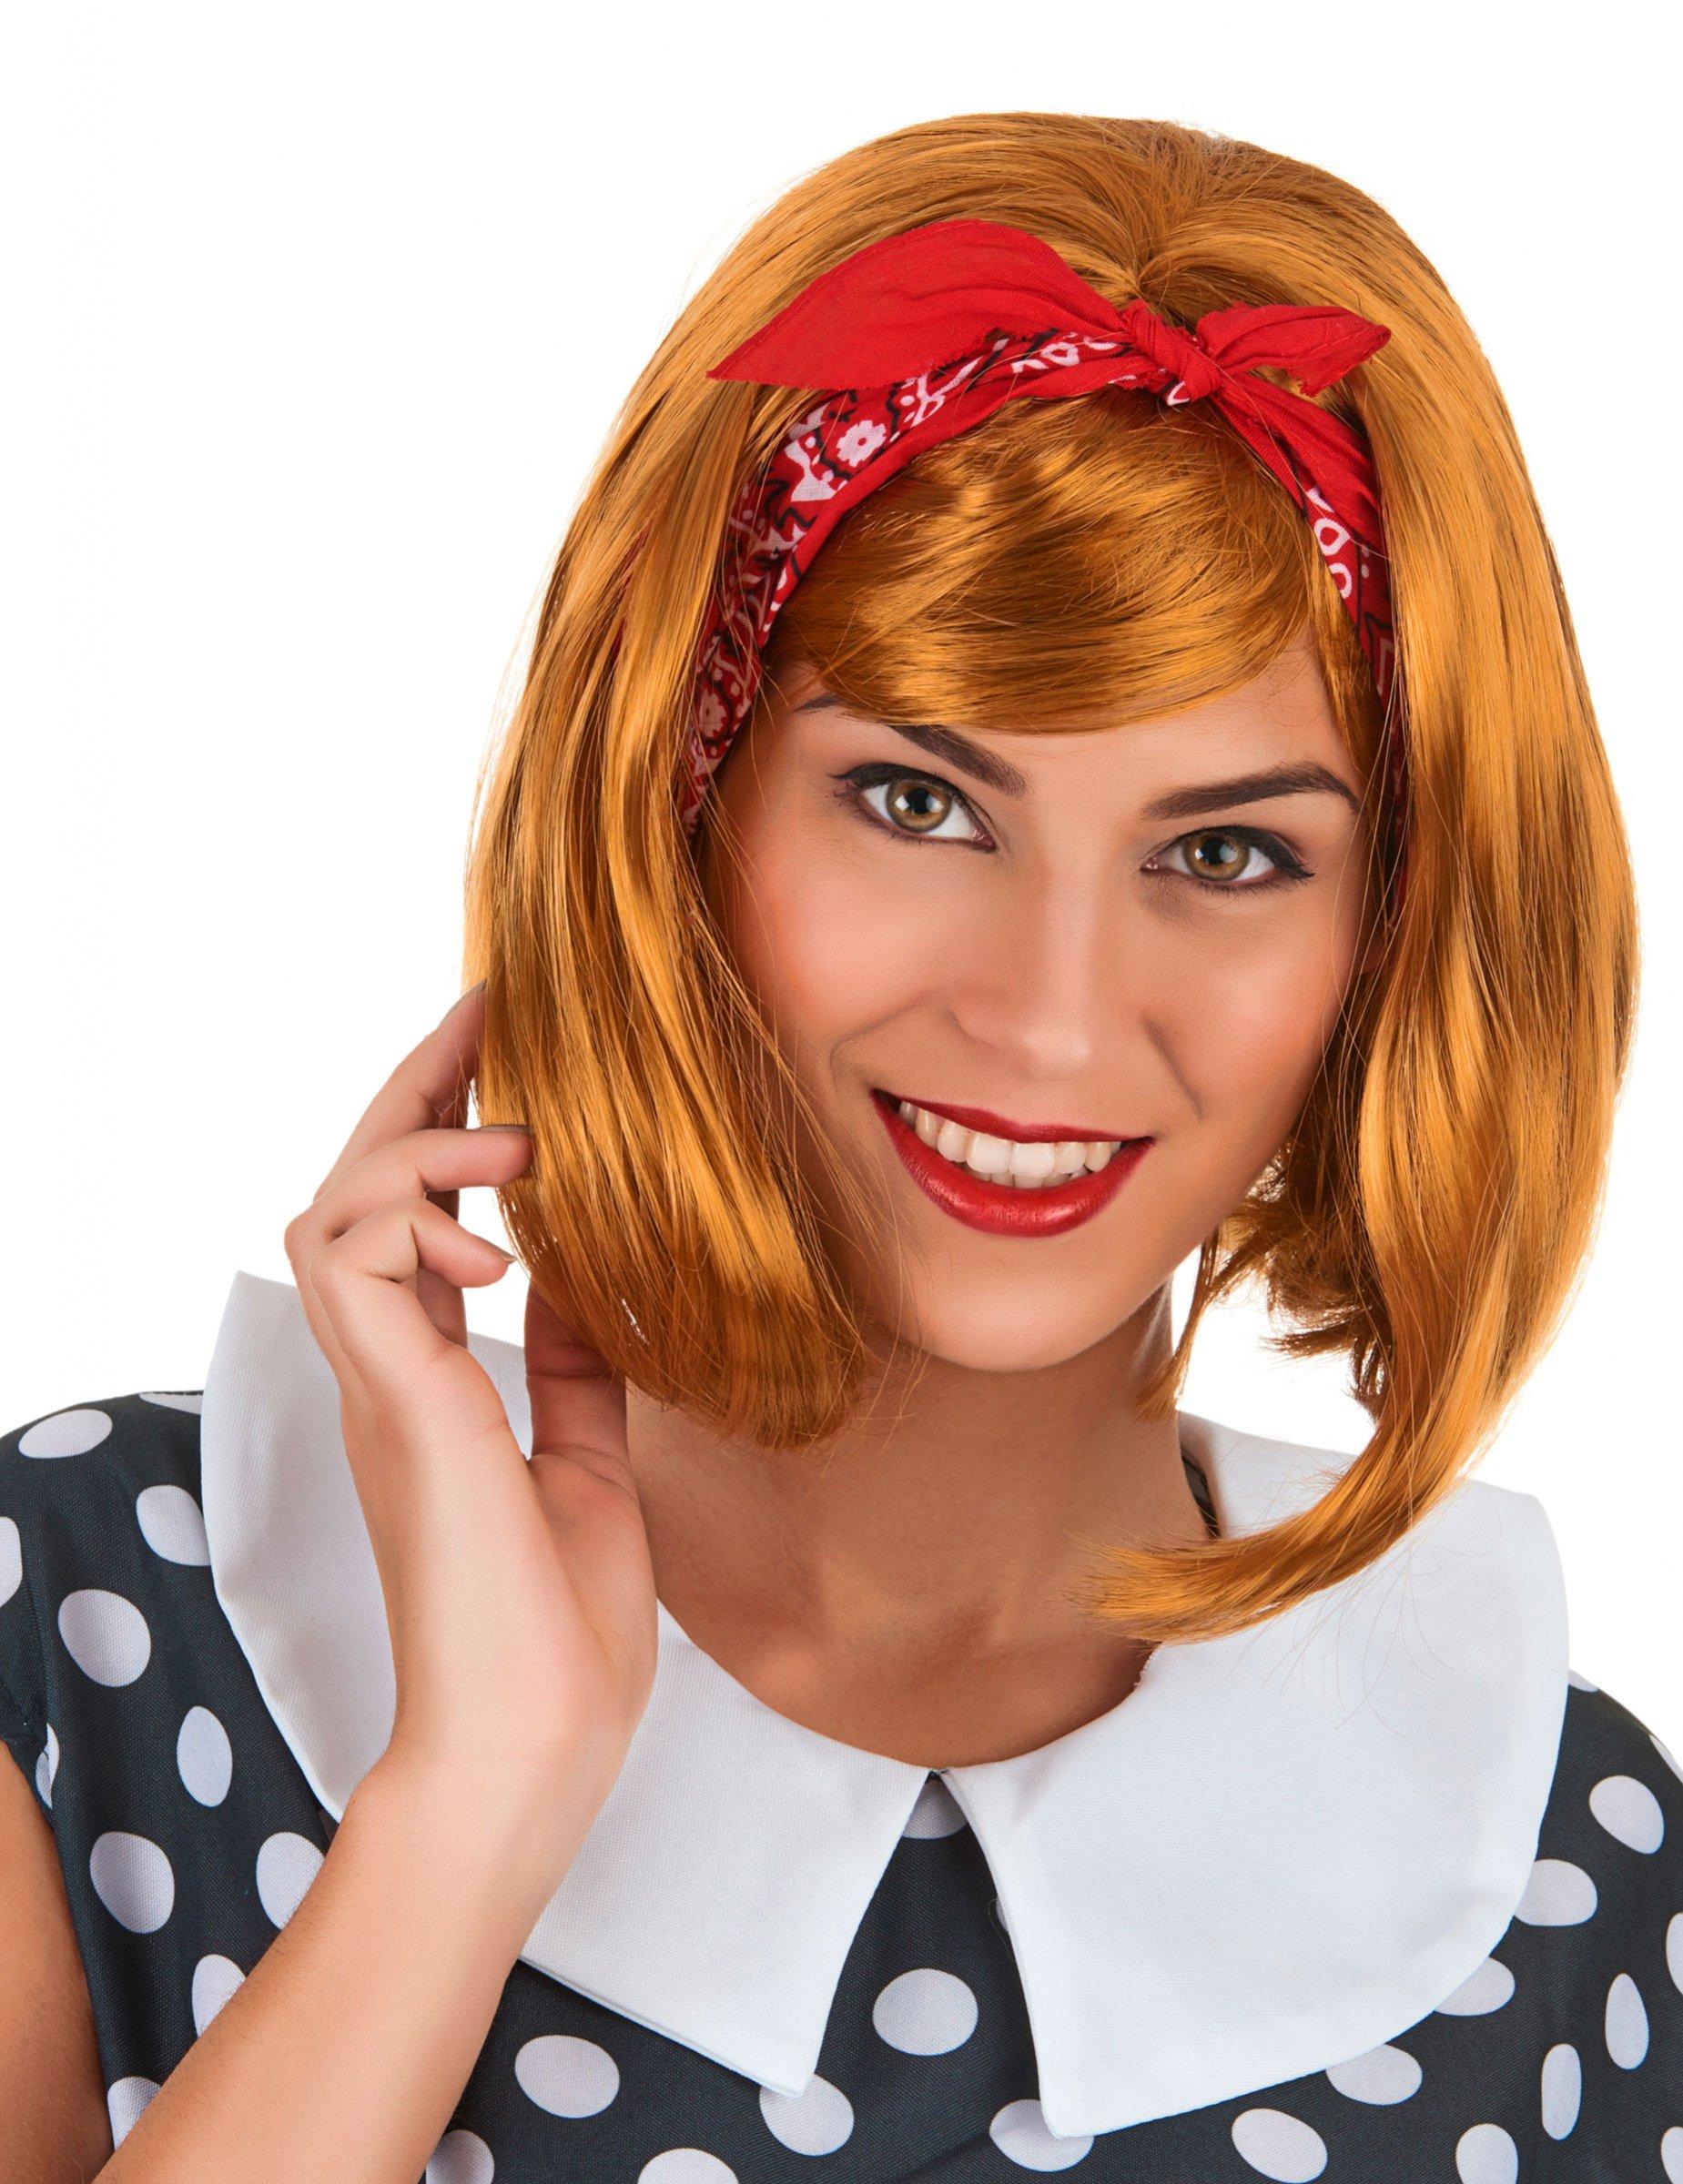 peluca pelirroja recta flequillo mujer pelucas y